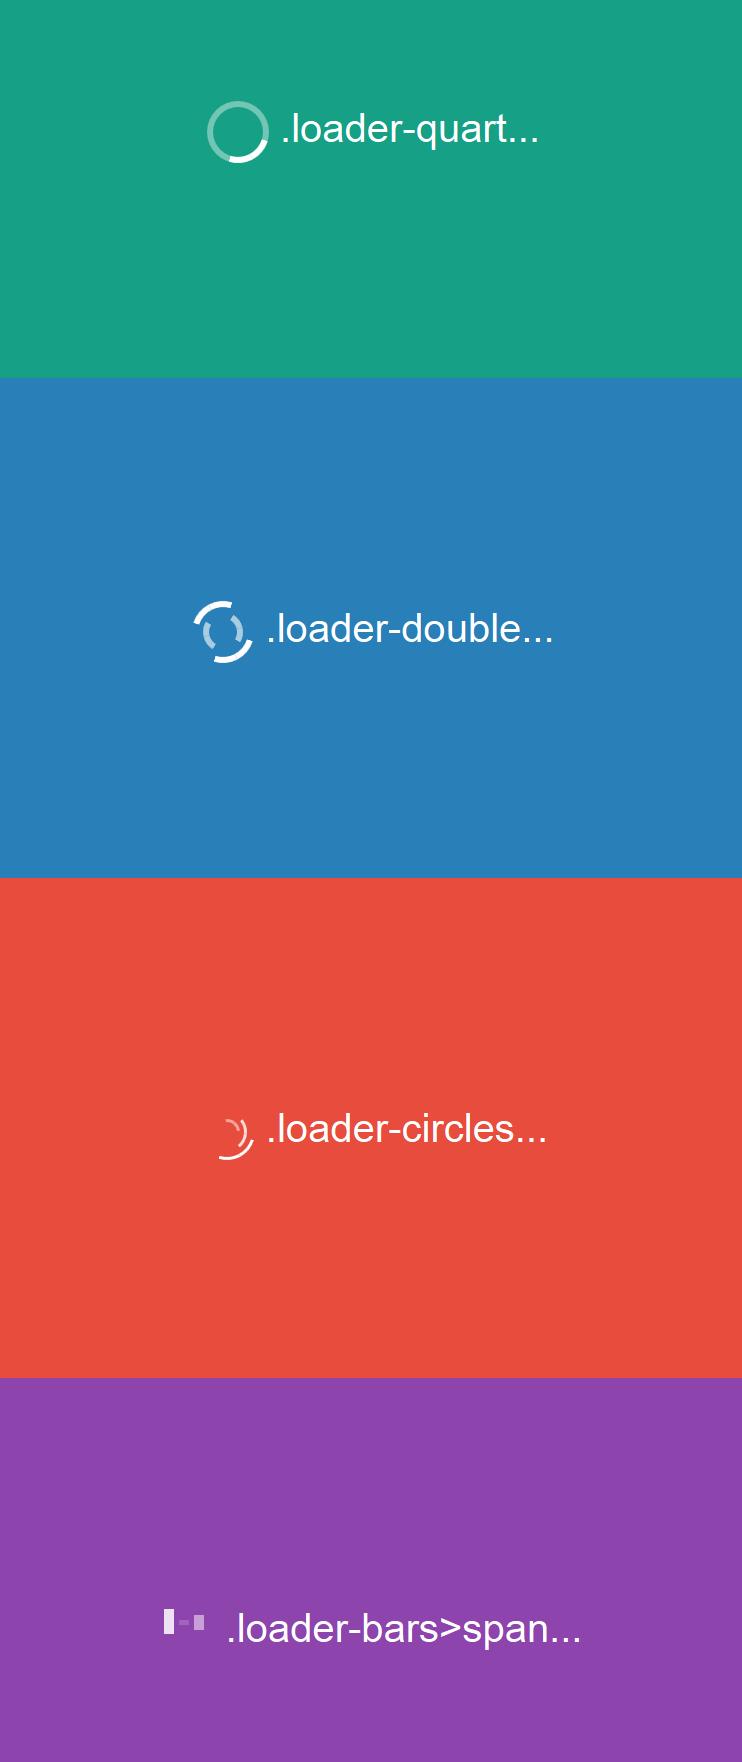 CSS3 Animated Loader http://www.ballychohan.com